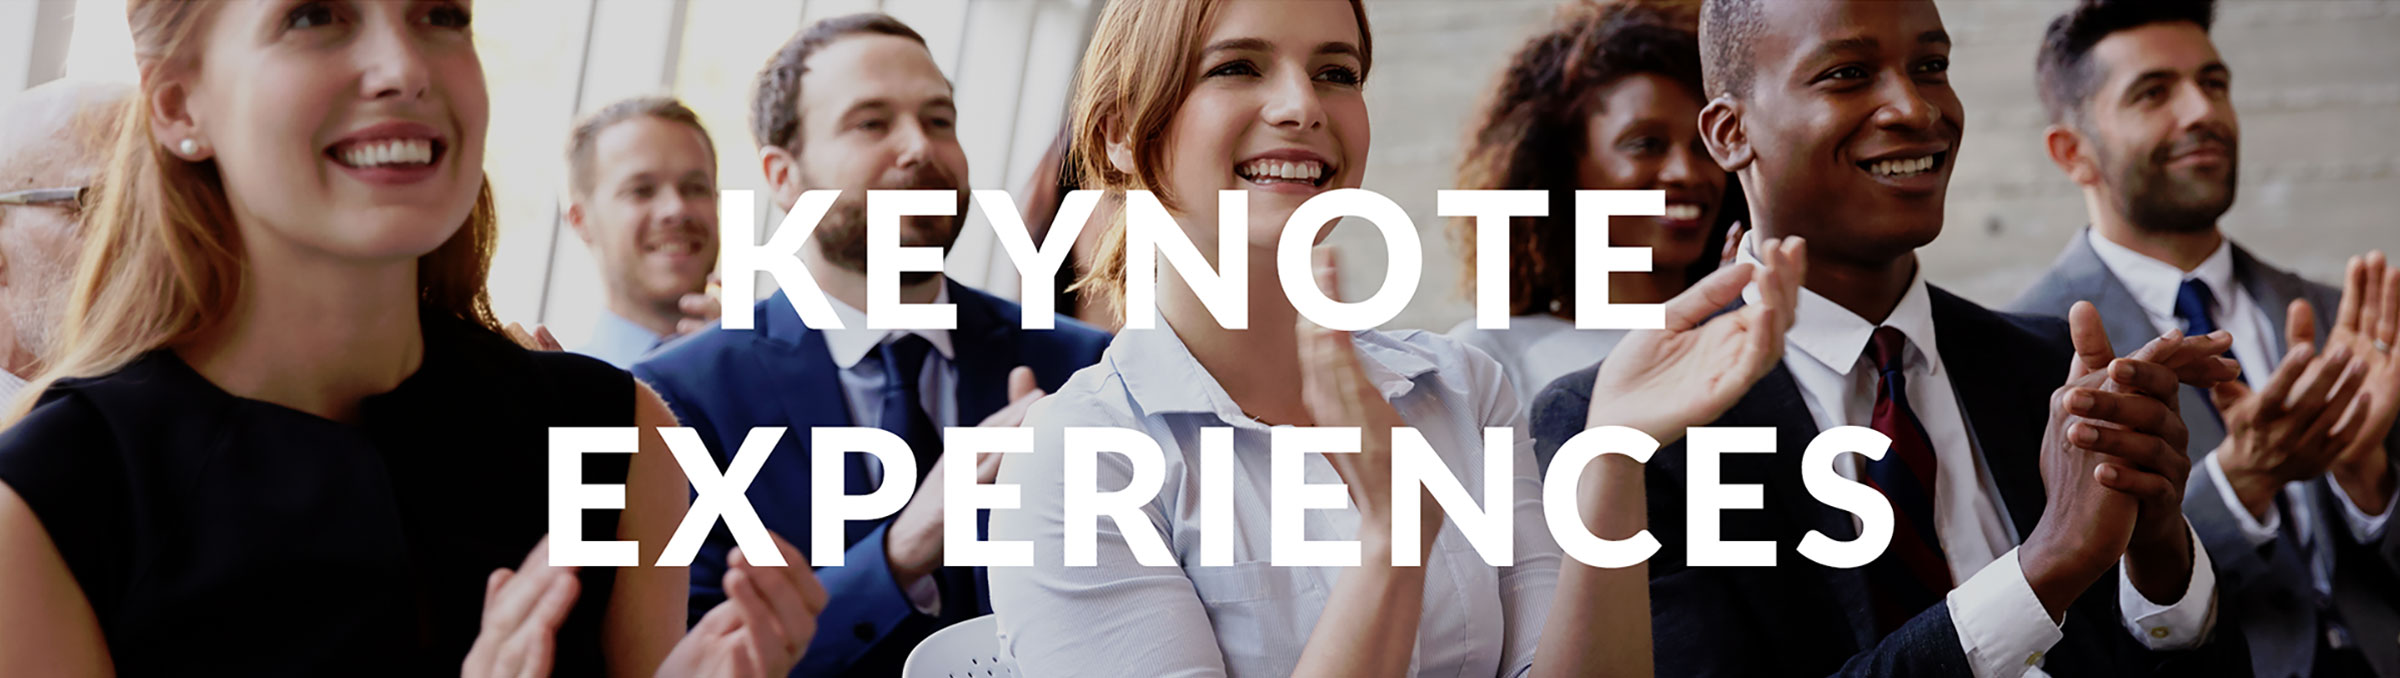 Keynote Experiences